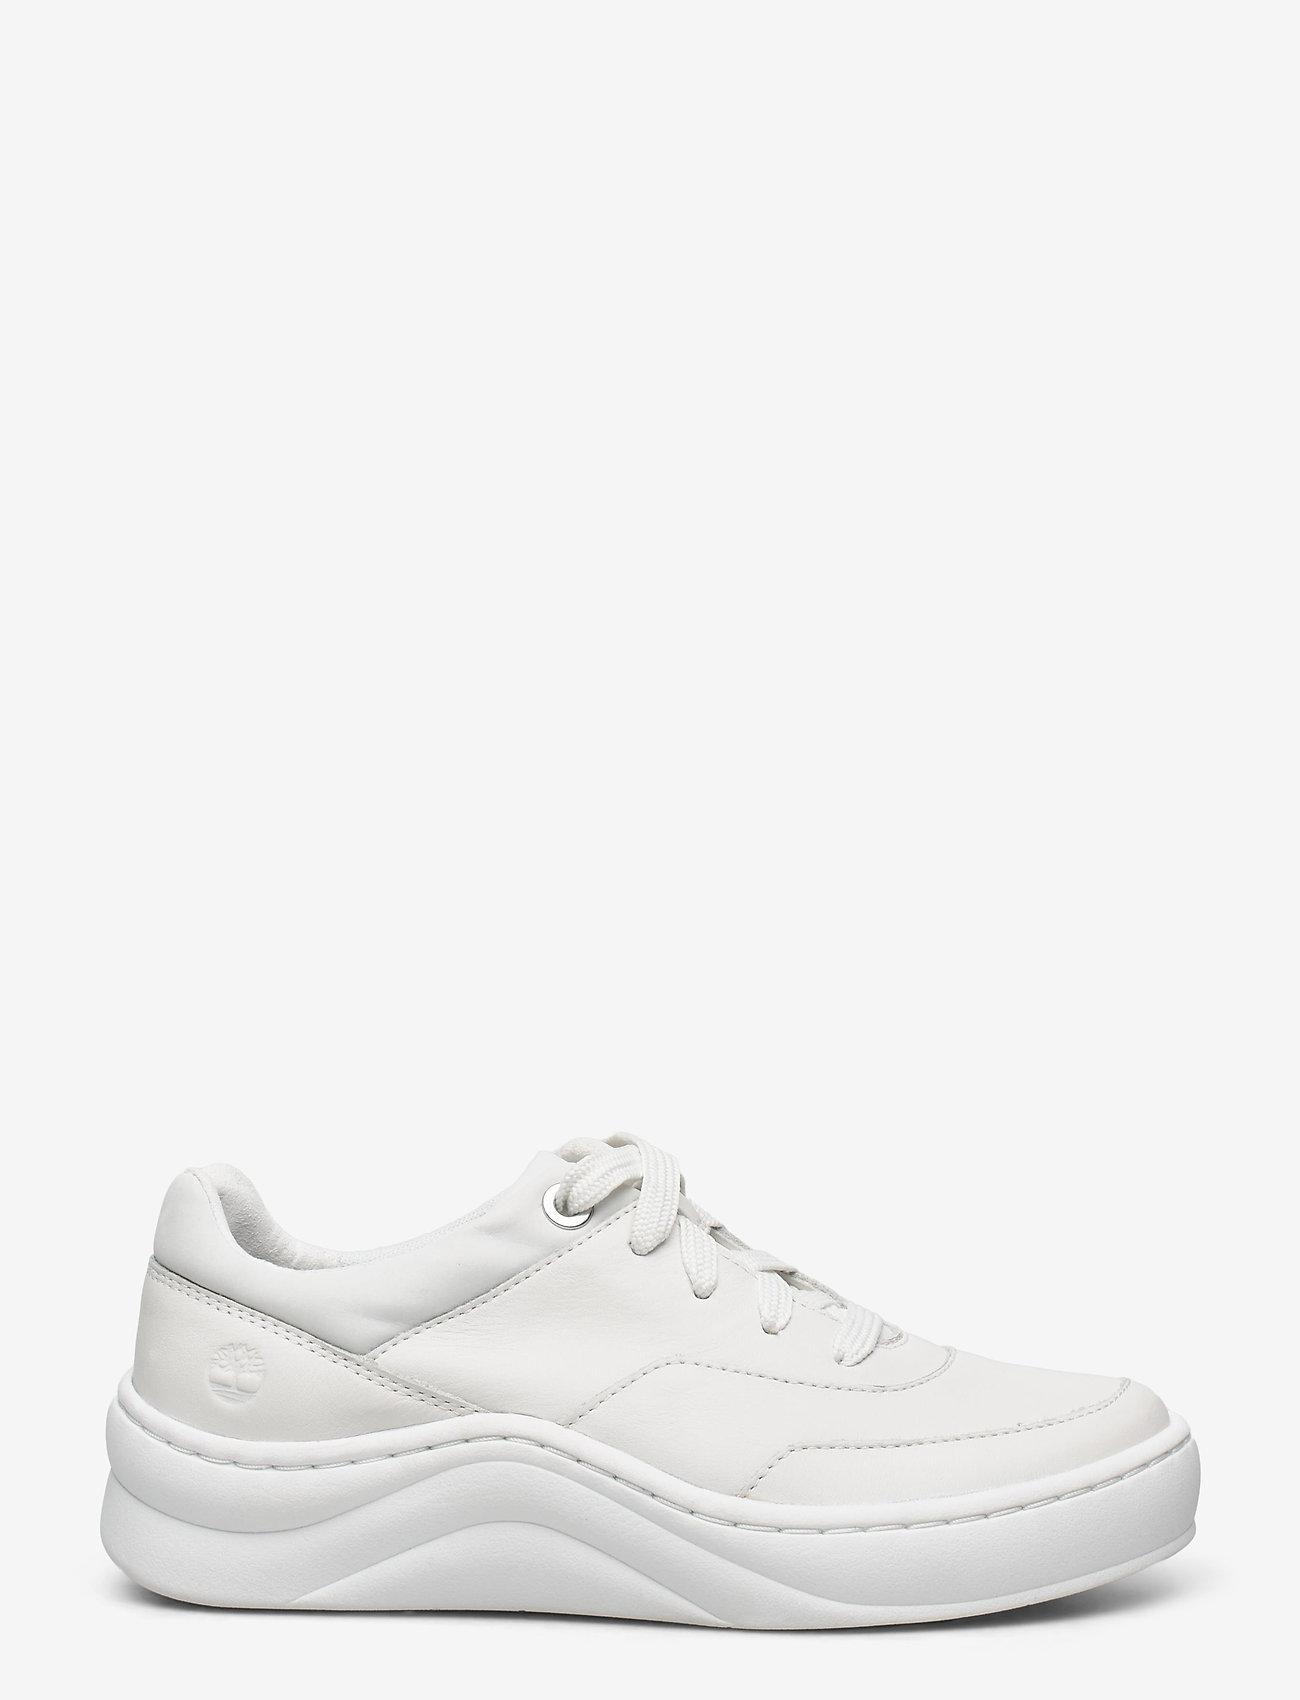 Timberland - RUBY ANN OX WHI - lage sneakers - blanc de blanc - 1